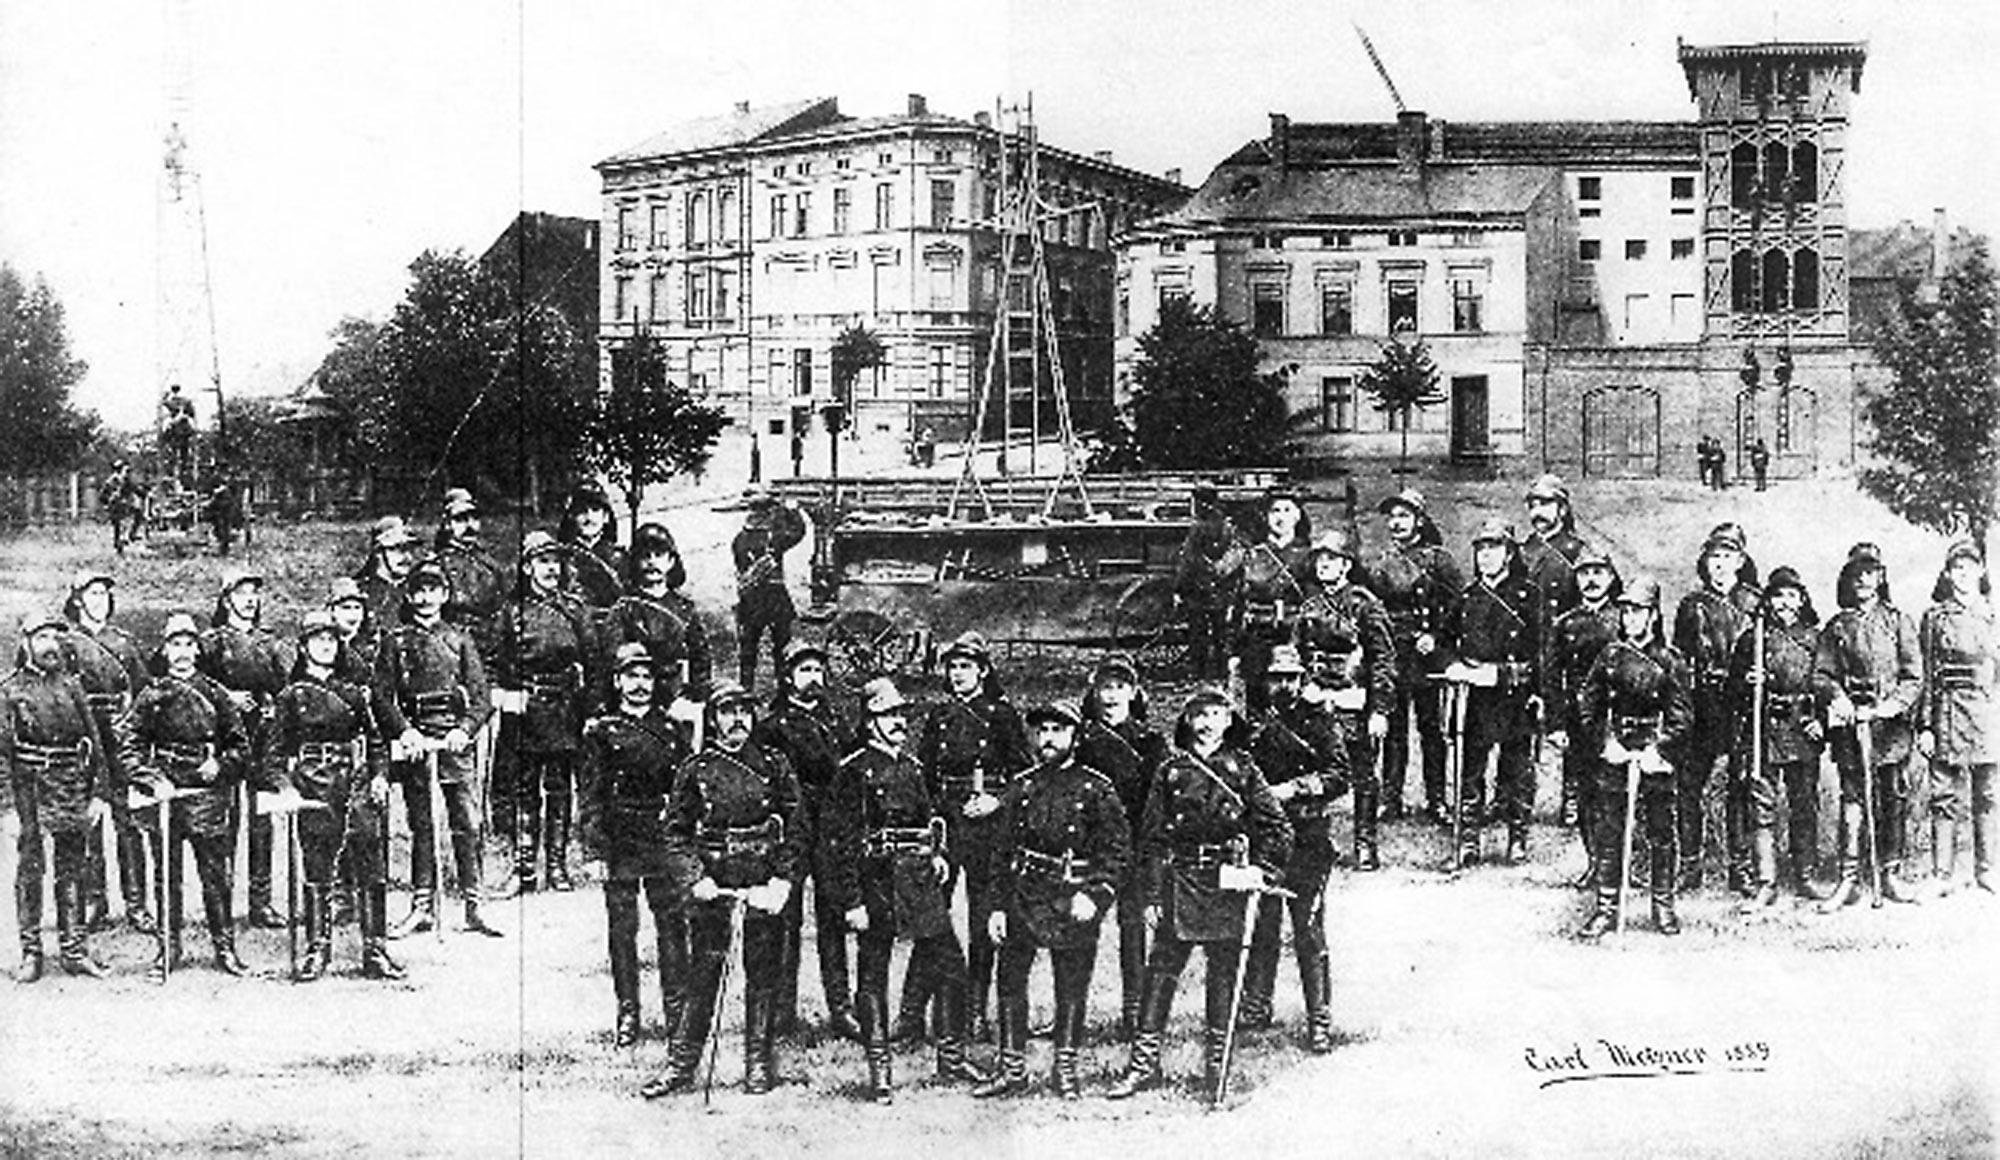 Feuerwehr_Cottbus_Historisch_Wandbild_Fassade_Parkhaus